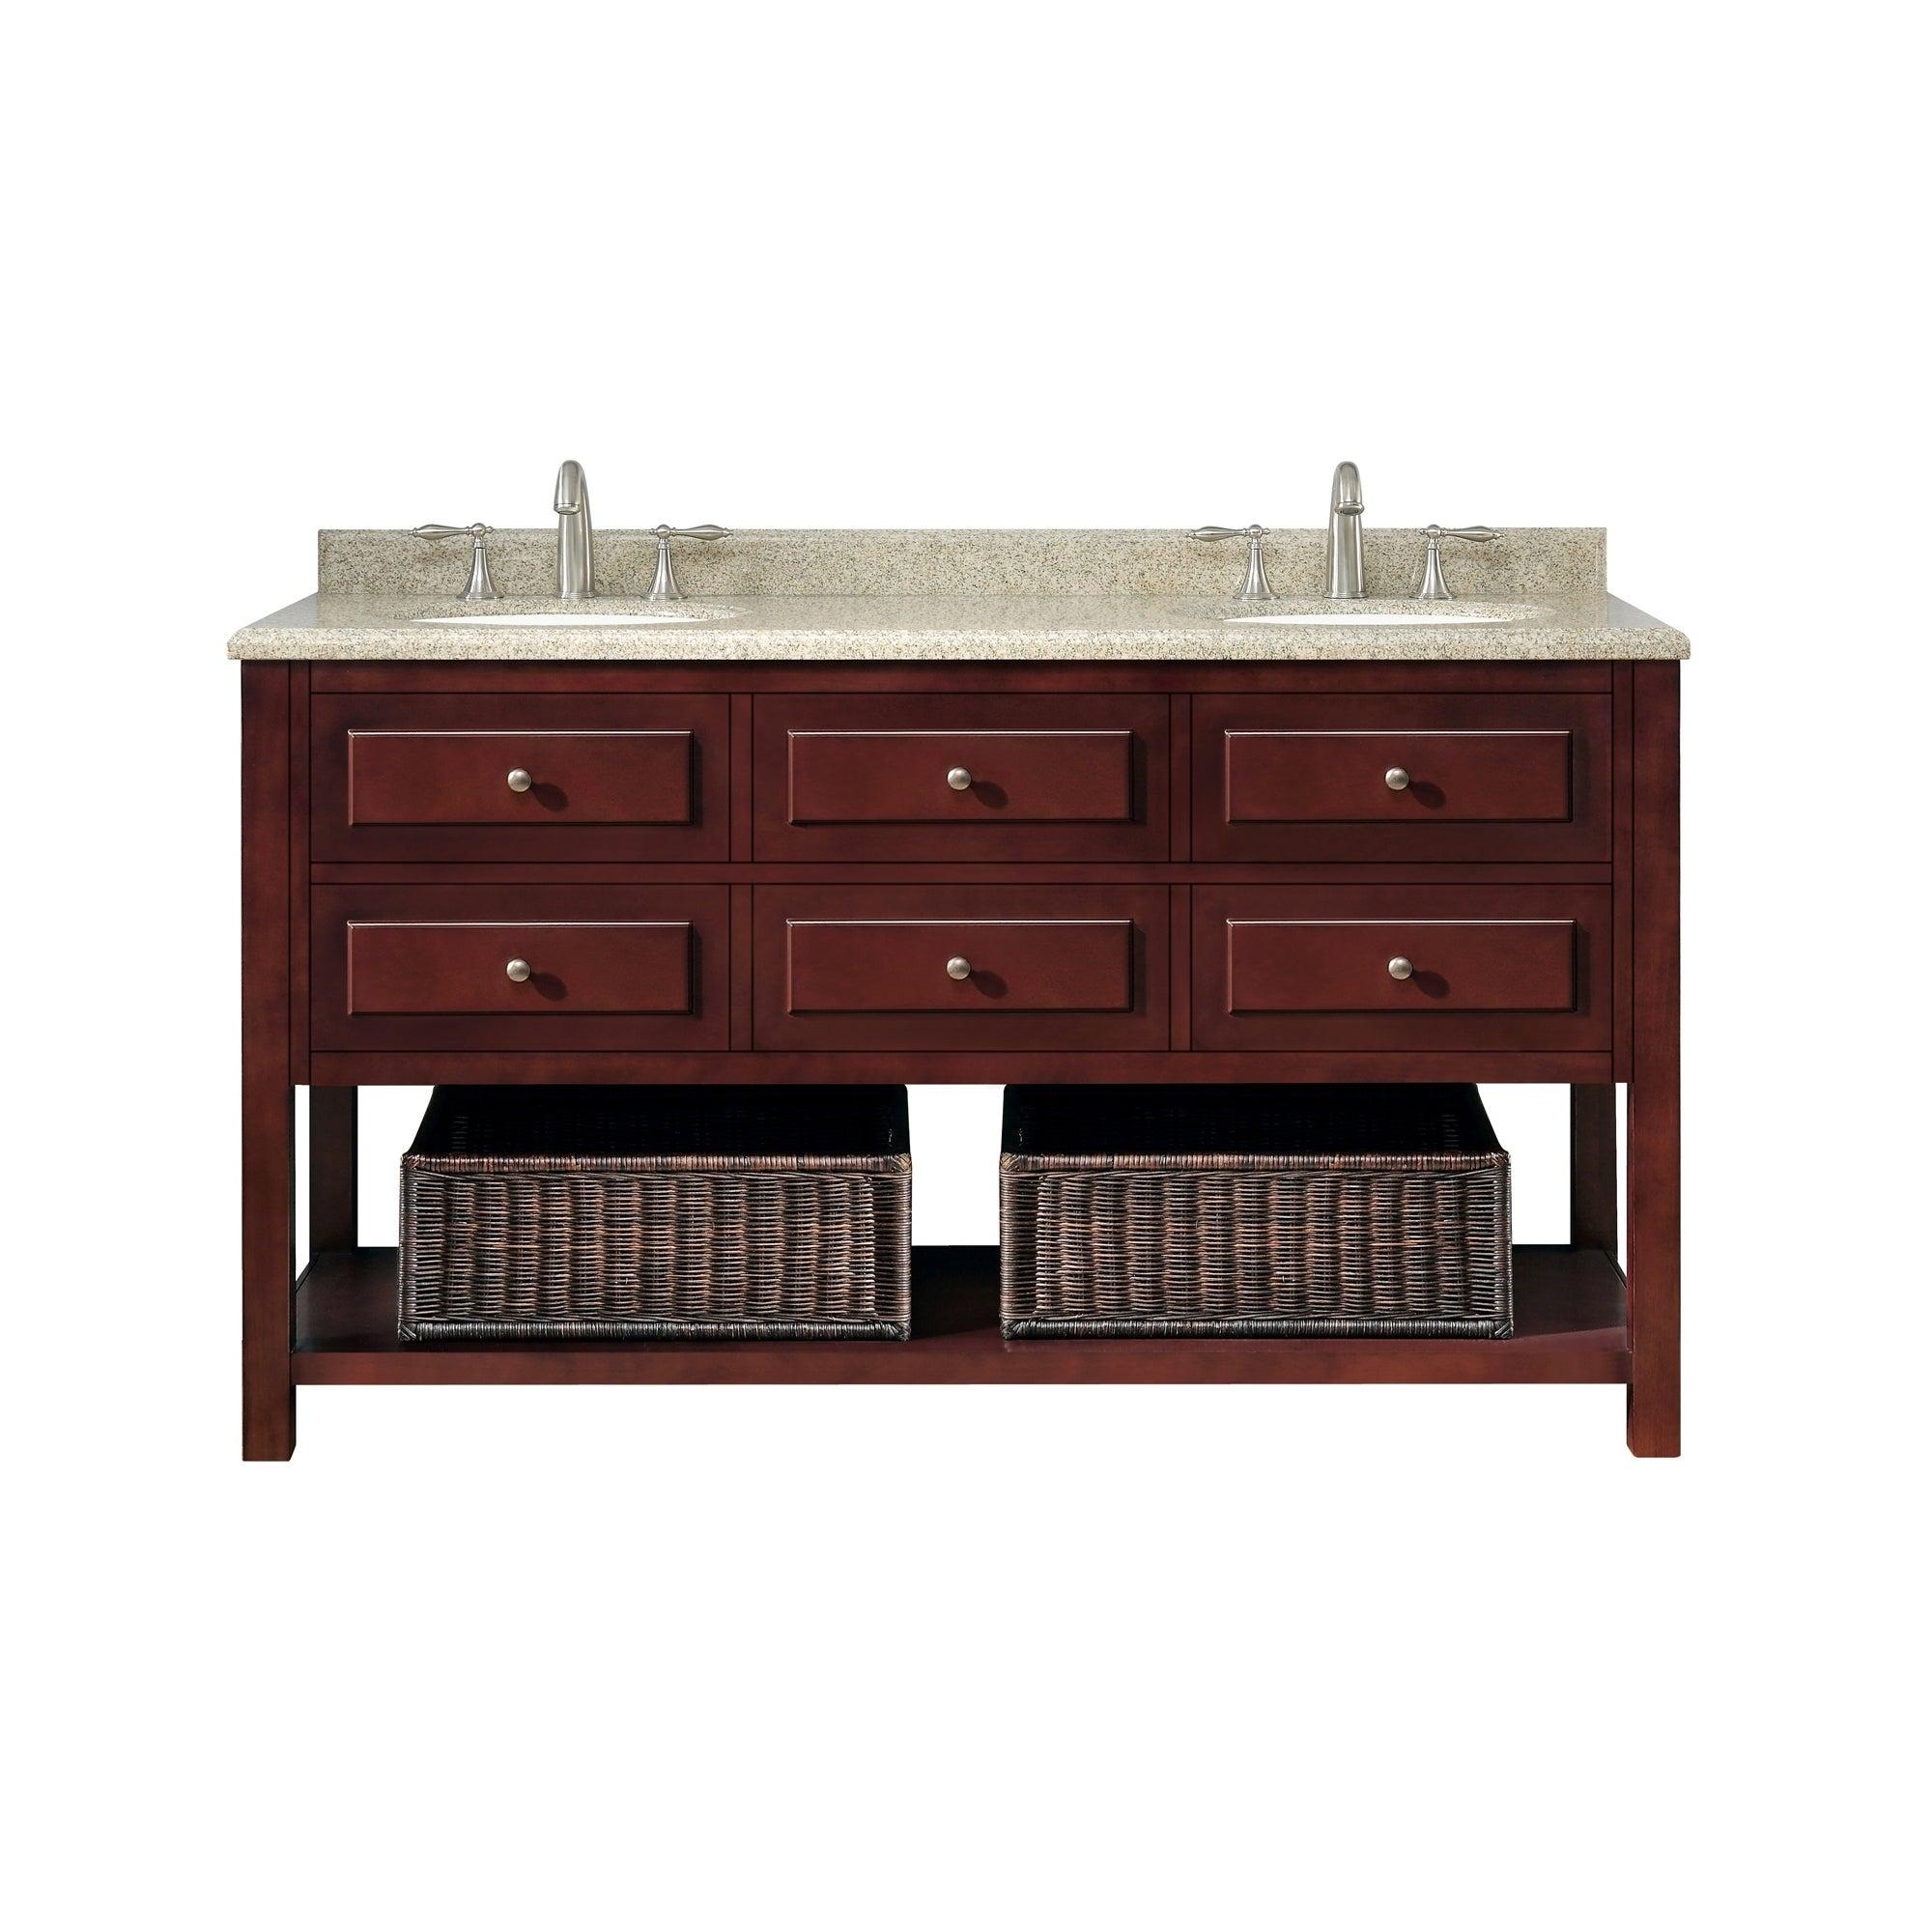 Details About OVE Decors Danny 60 Inch Double Sink Bathroom Vanity Granite  Top